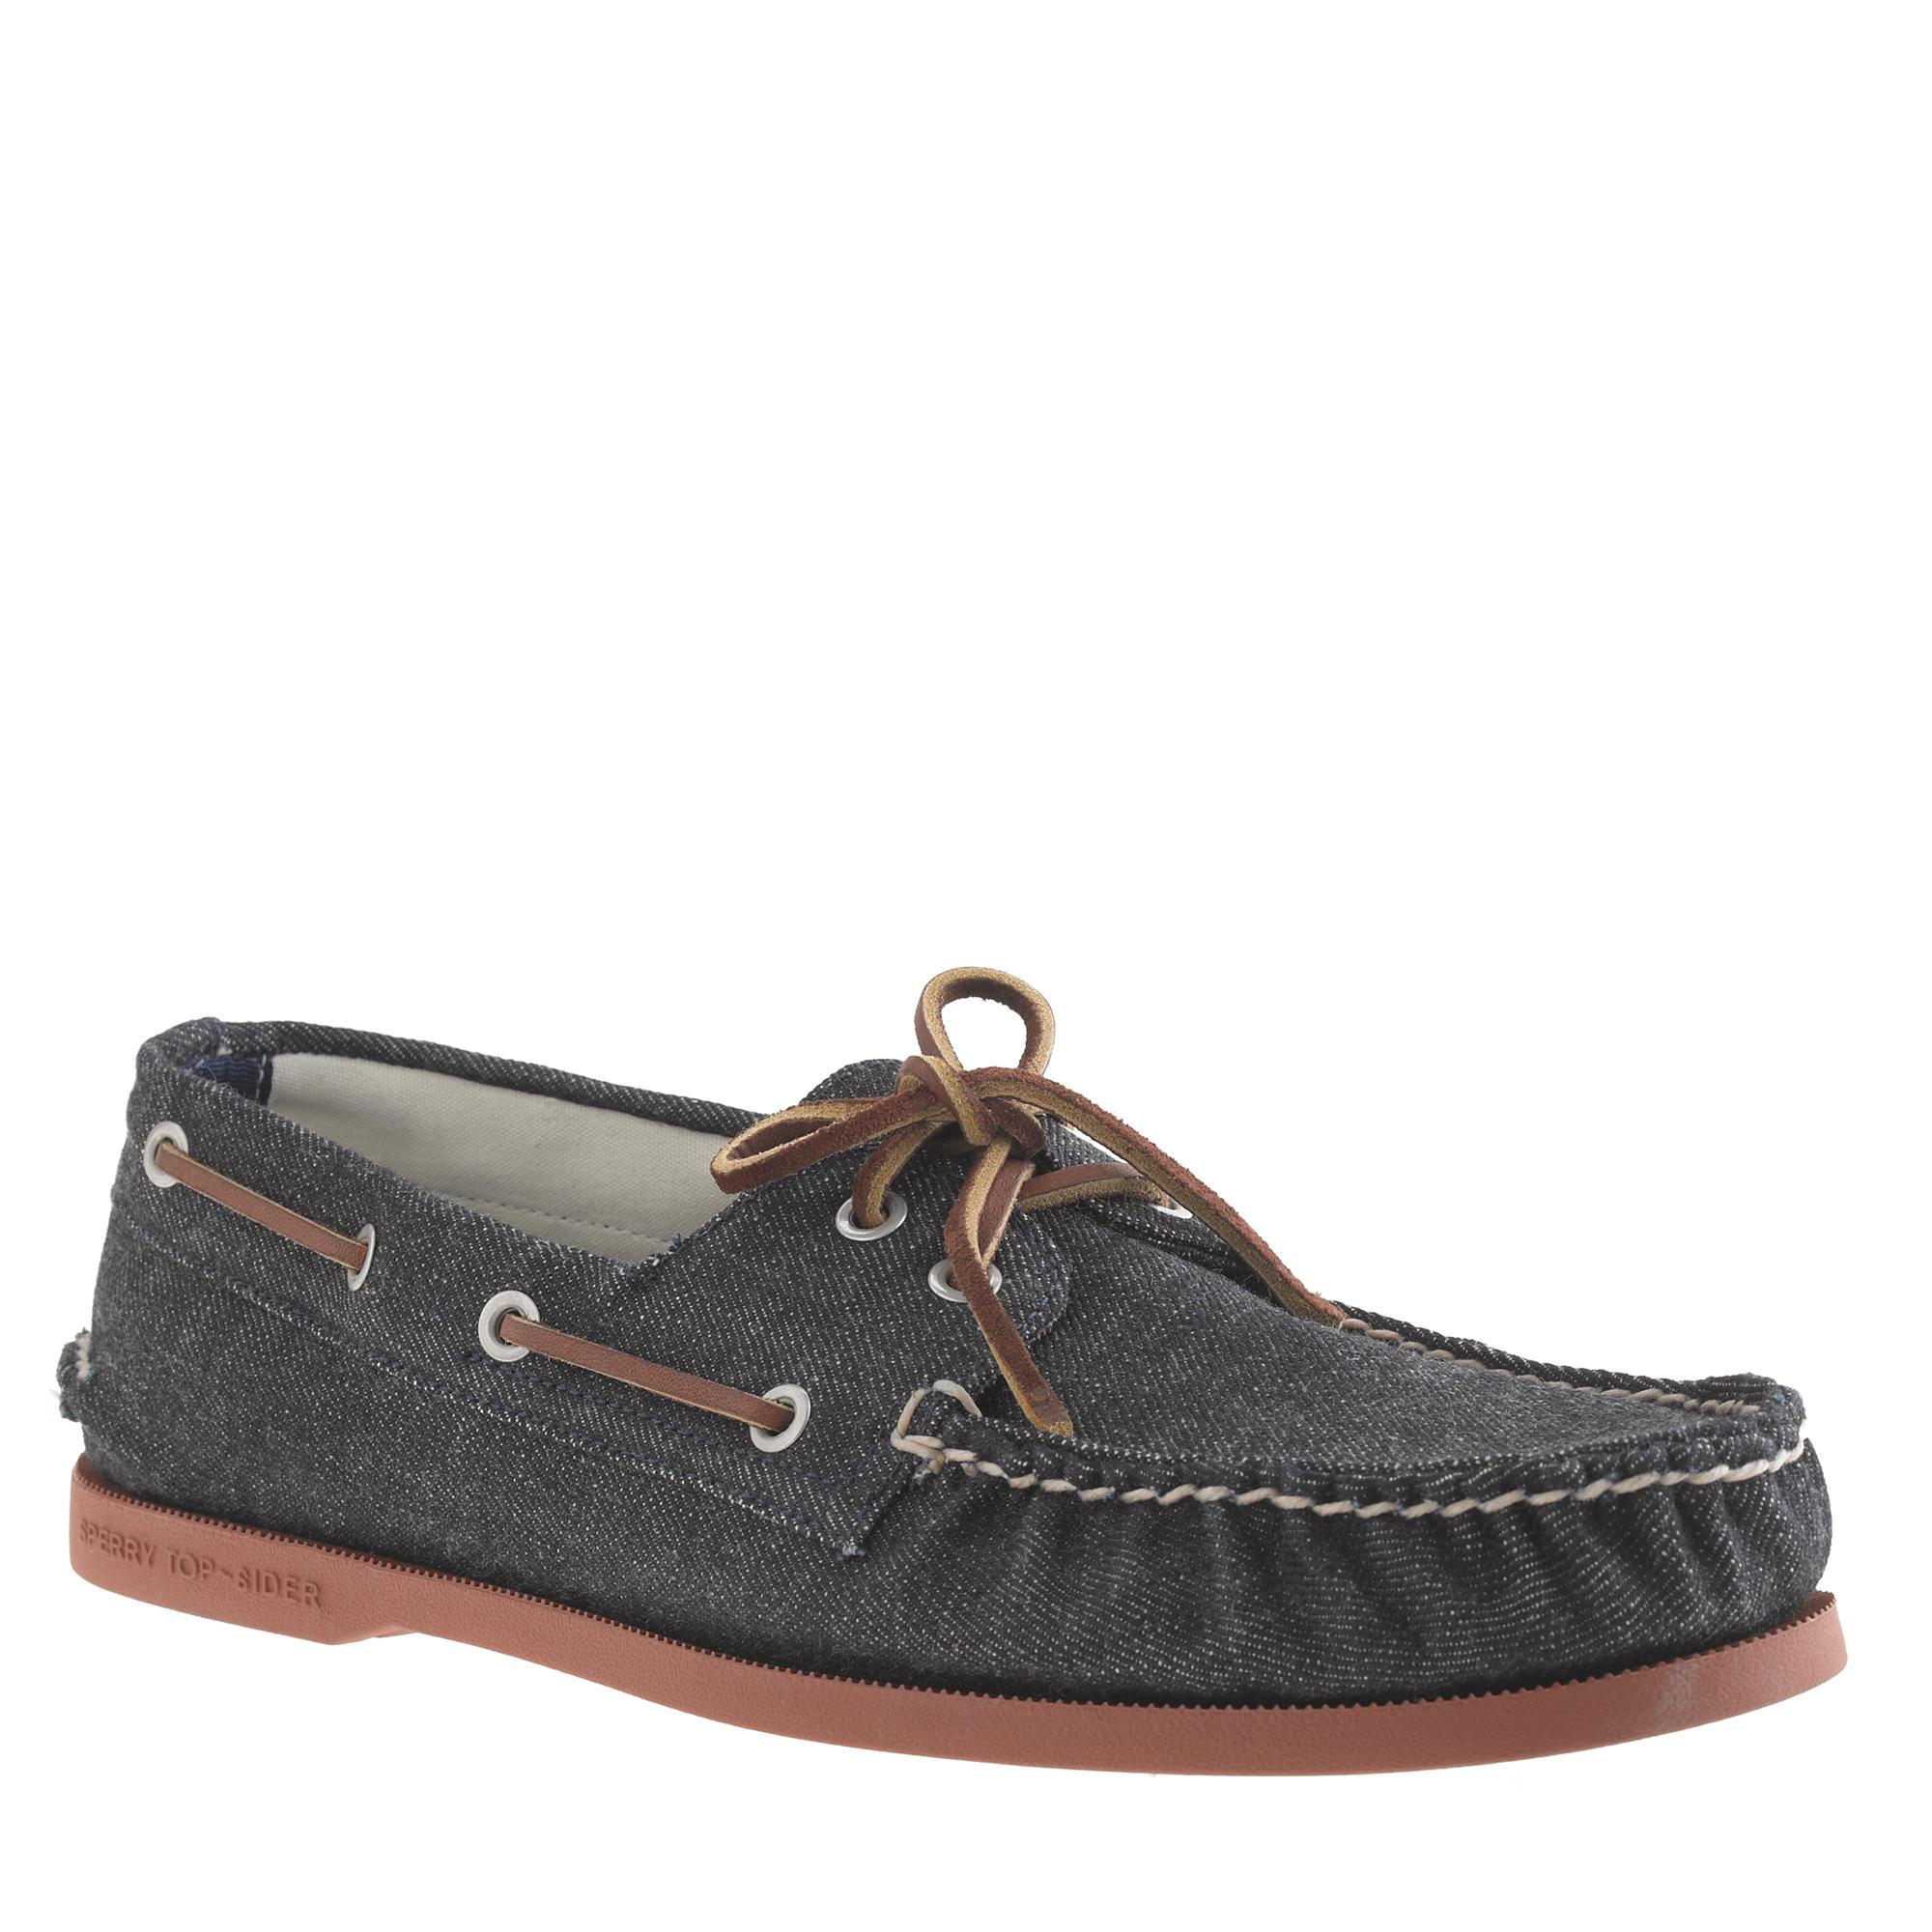 J Crew Mens Shoe Sperry